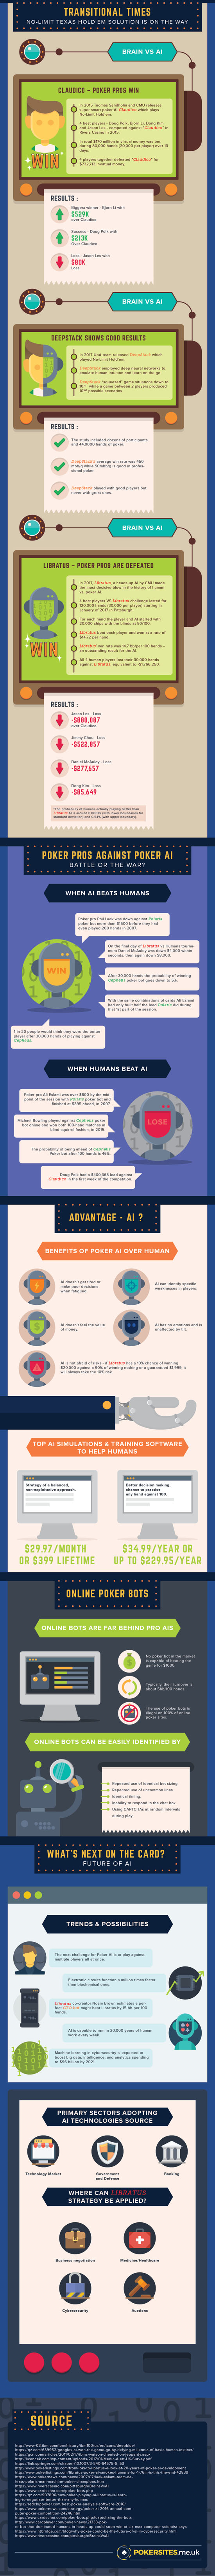 AI与扑克大战30年 为何现在才全面碾压